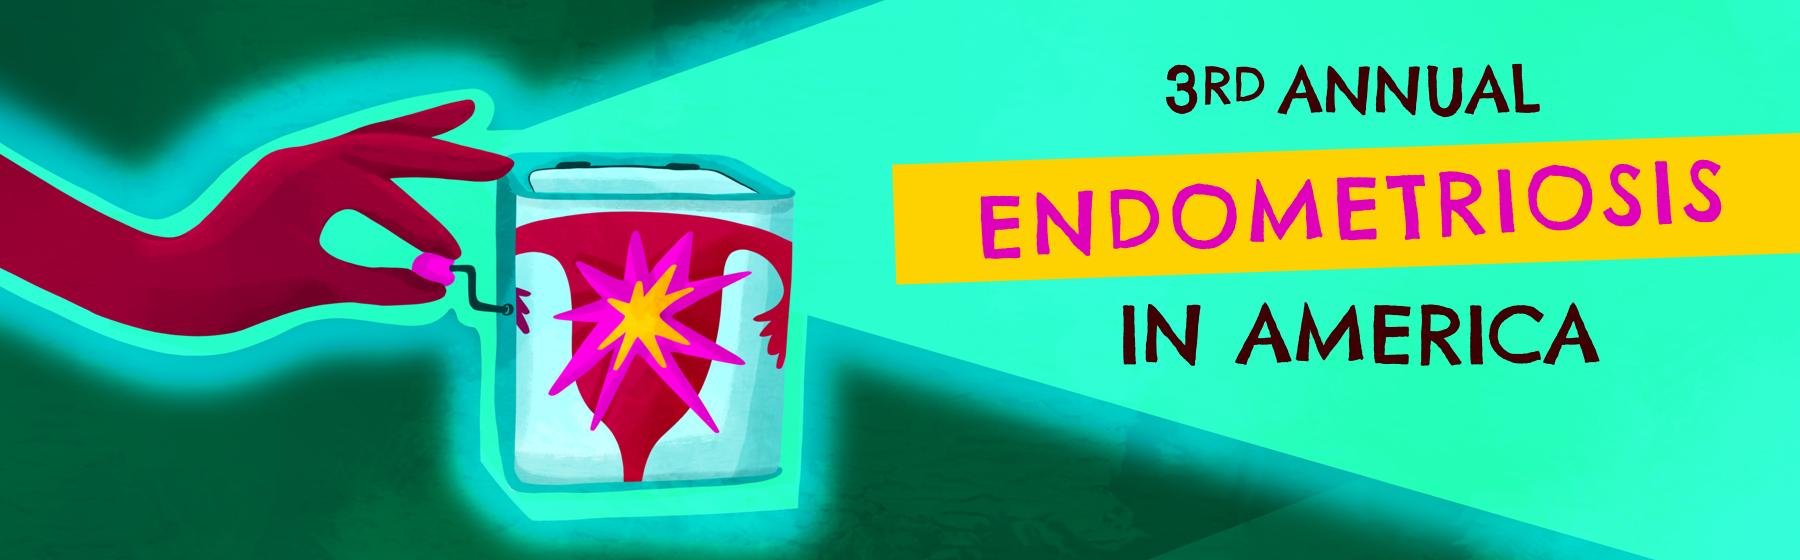 Survey Provides Deep Dive into Deep Infiltrative Endometriosis